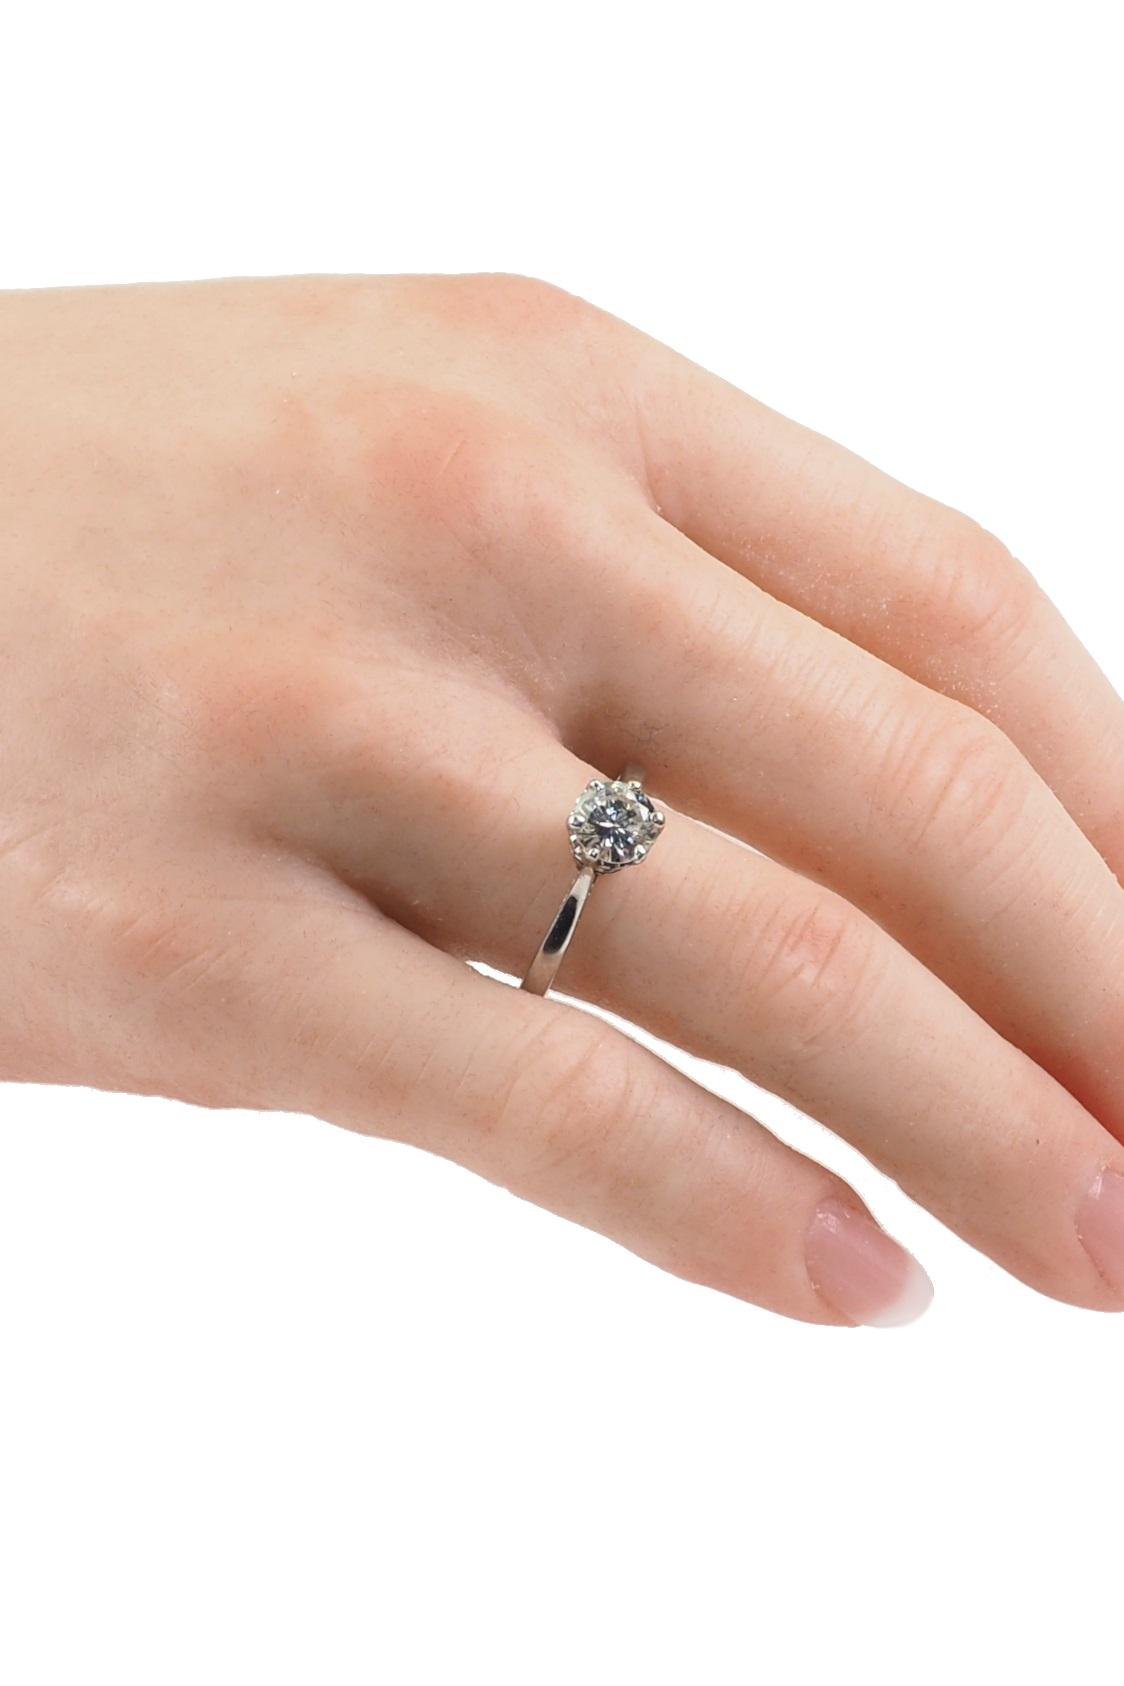 0215-Rheinfrank-Diamantring